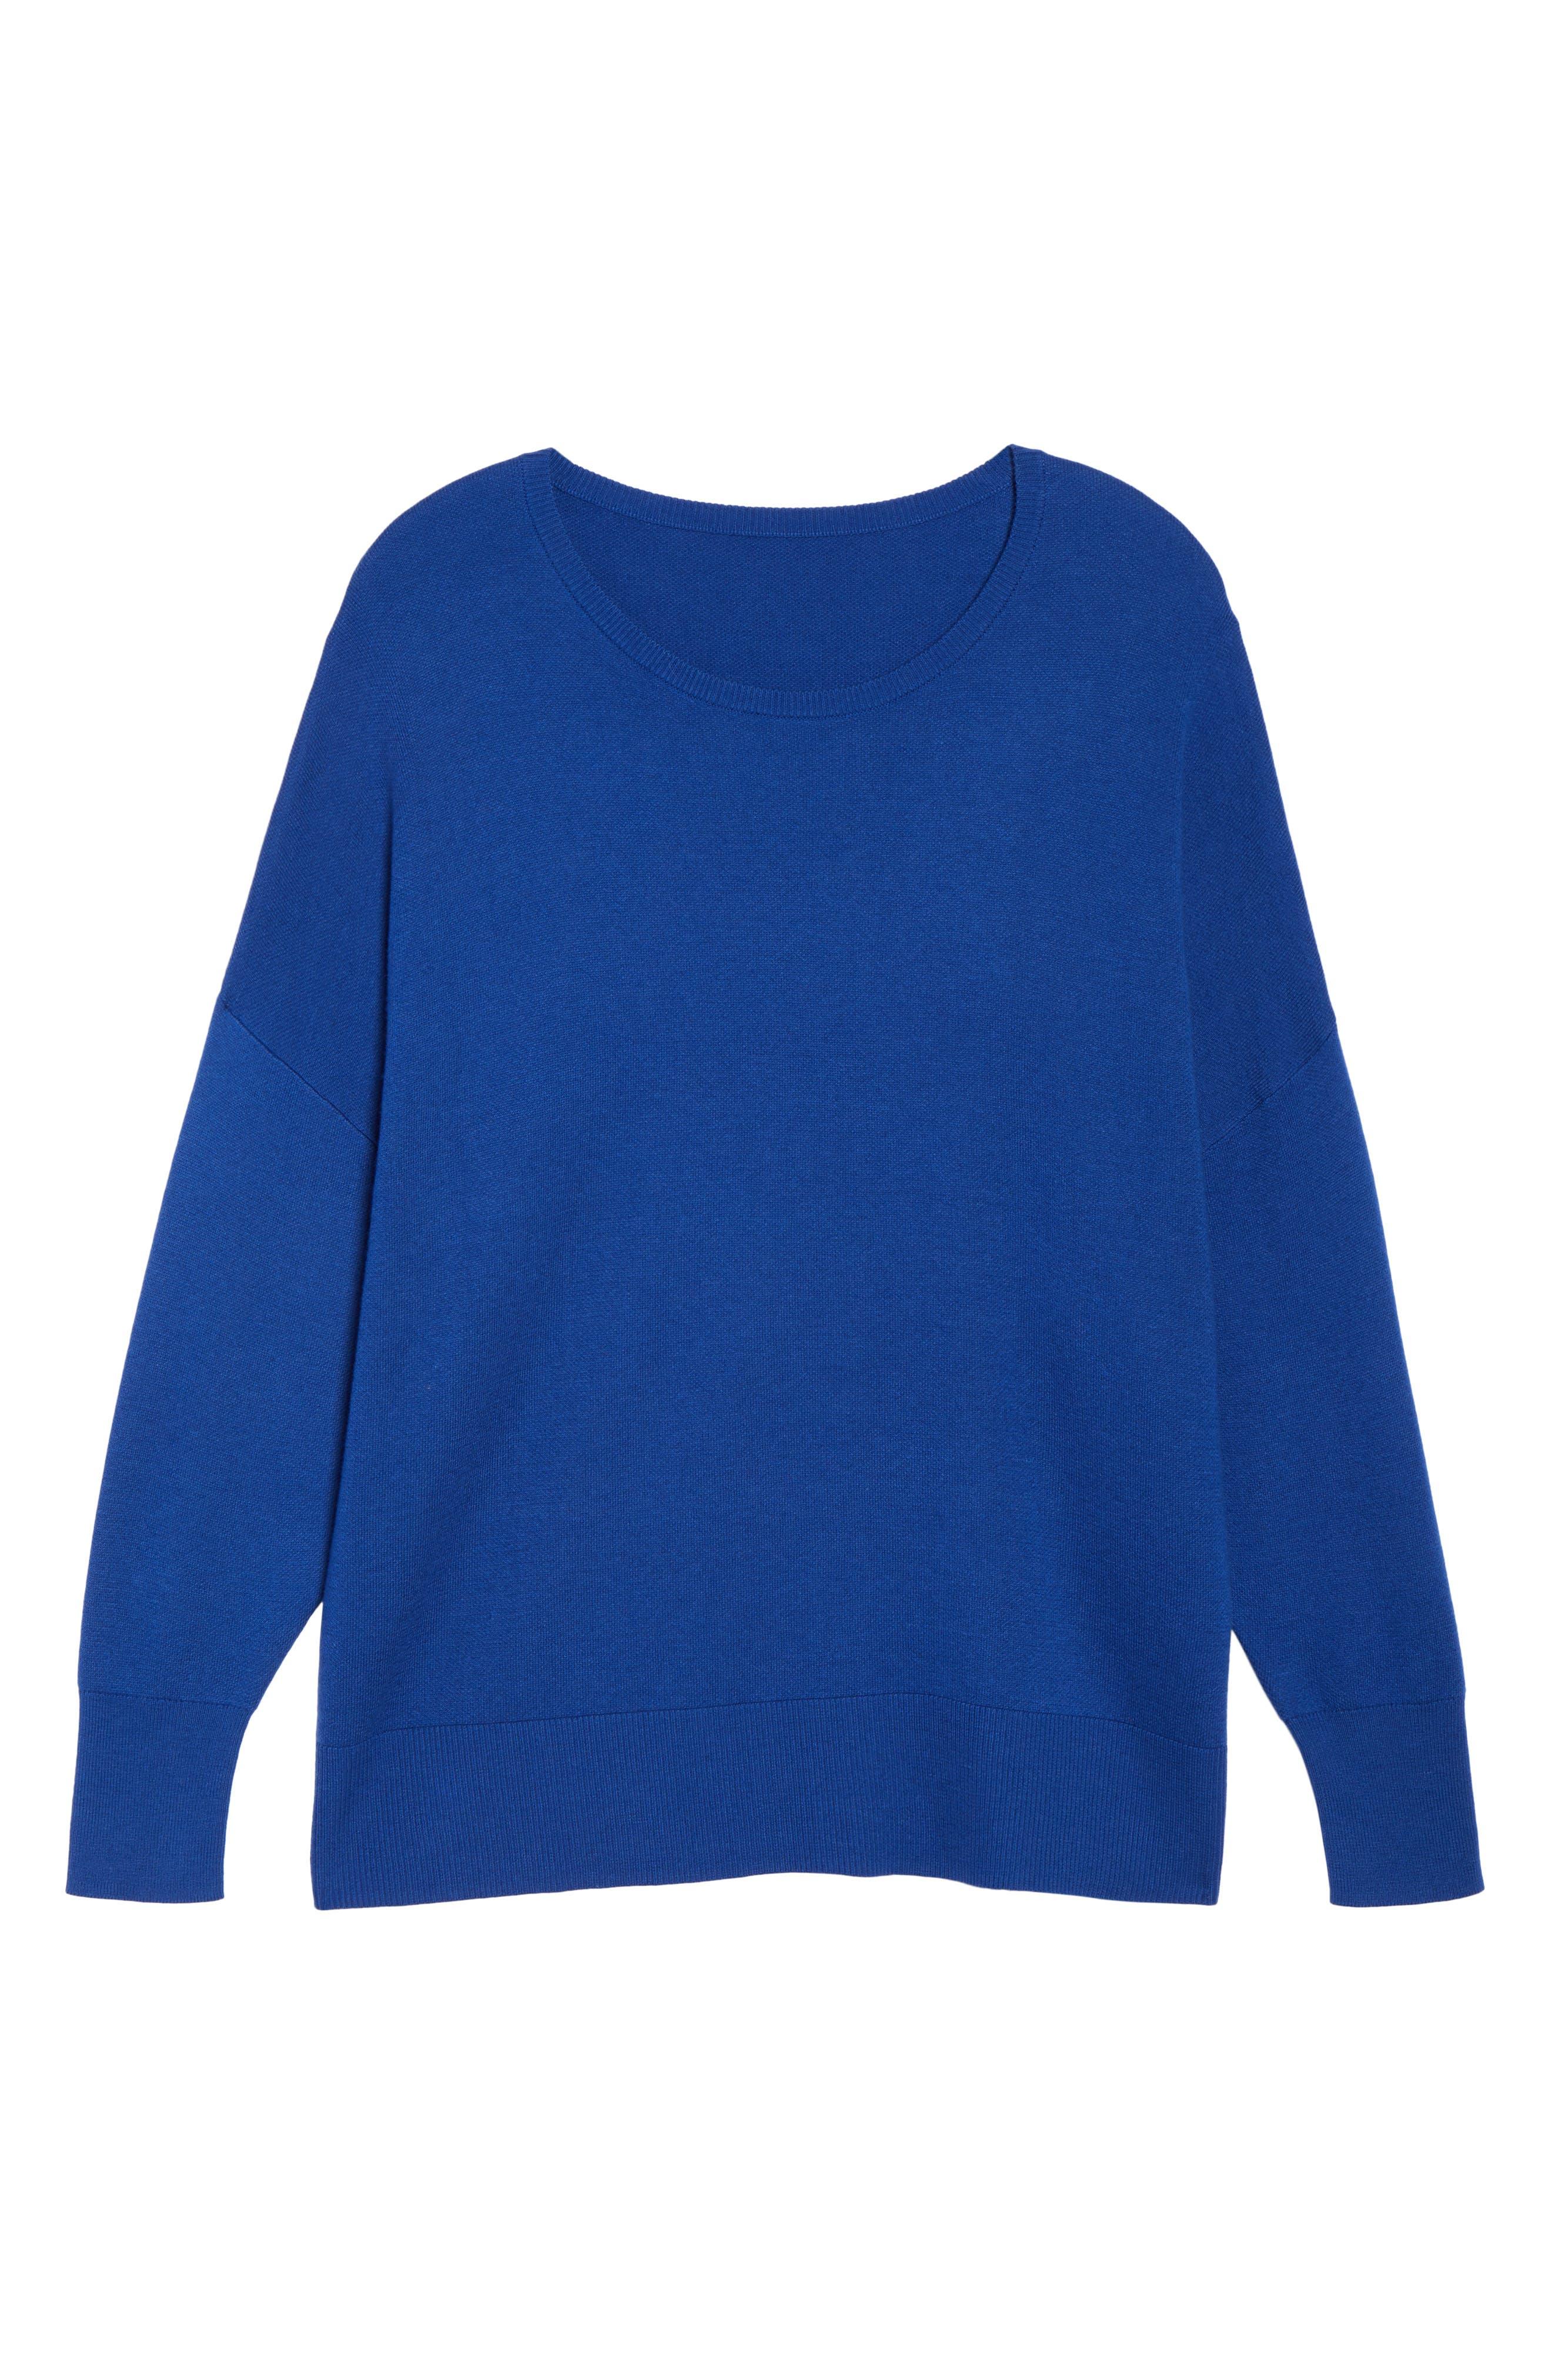 Dolman Sleeve Crewneck Sweater,                             Alternate thumbnail 6, color,                             Blue Mazarine